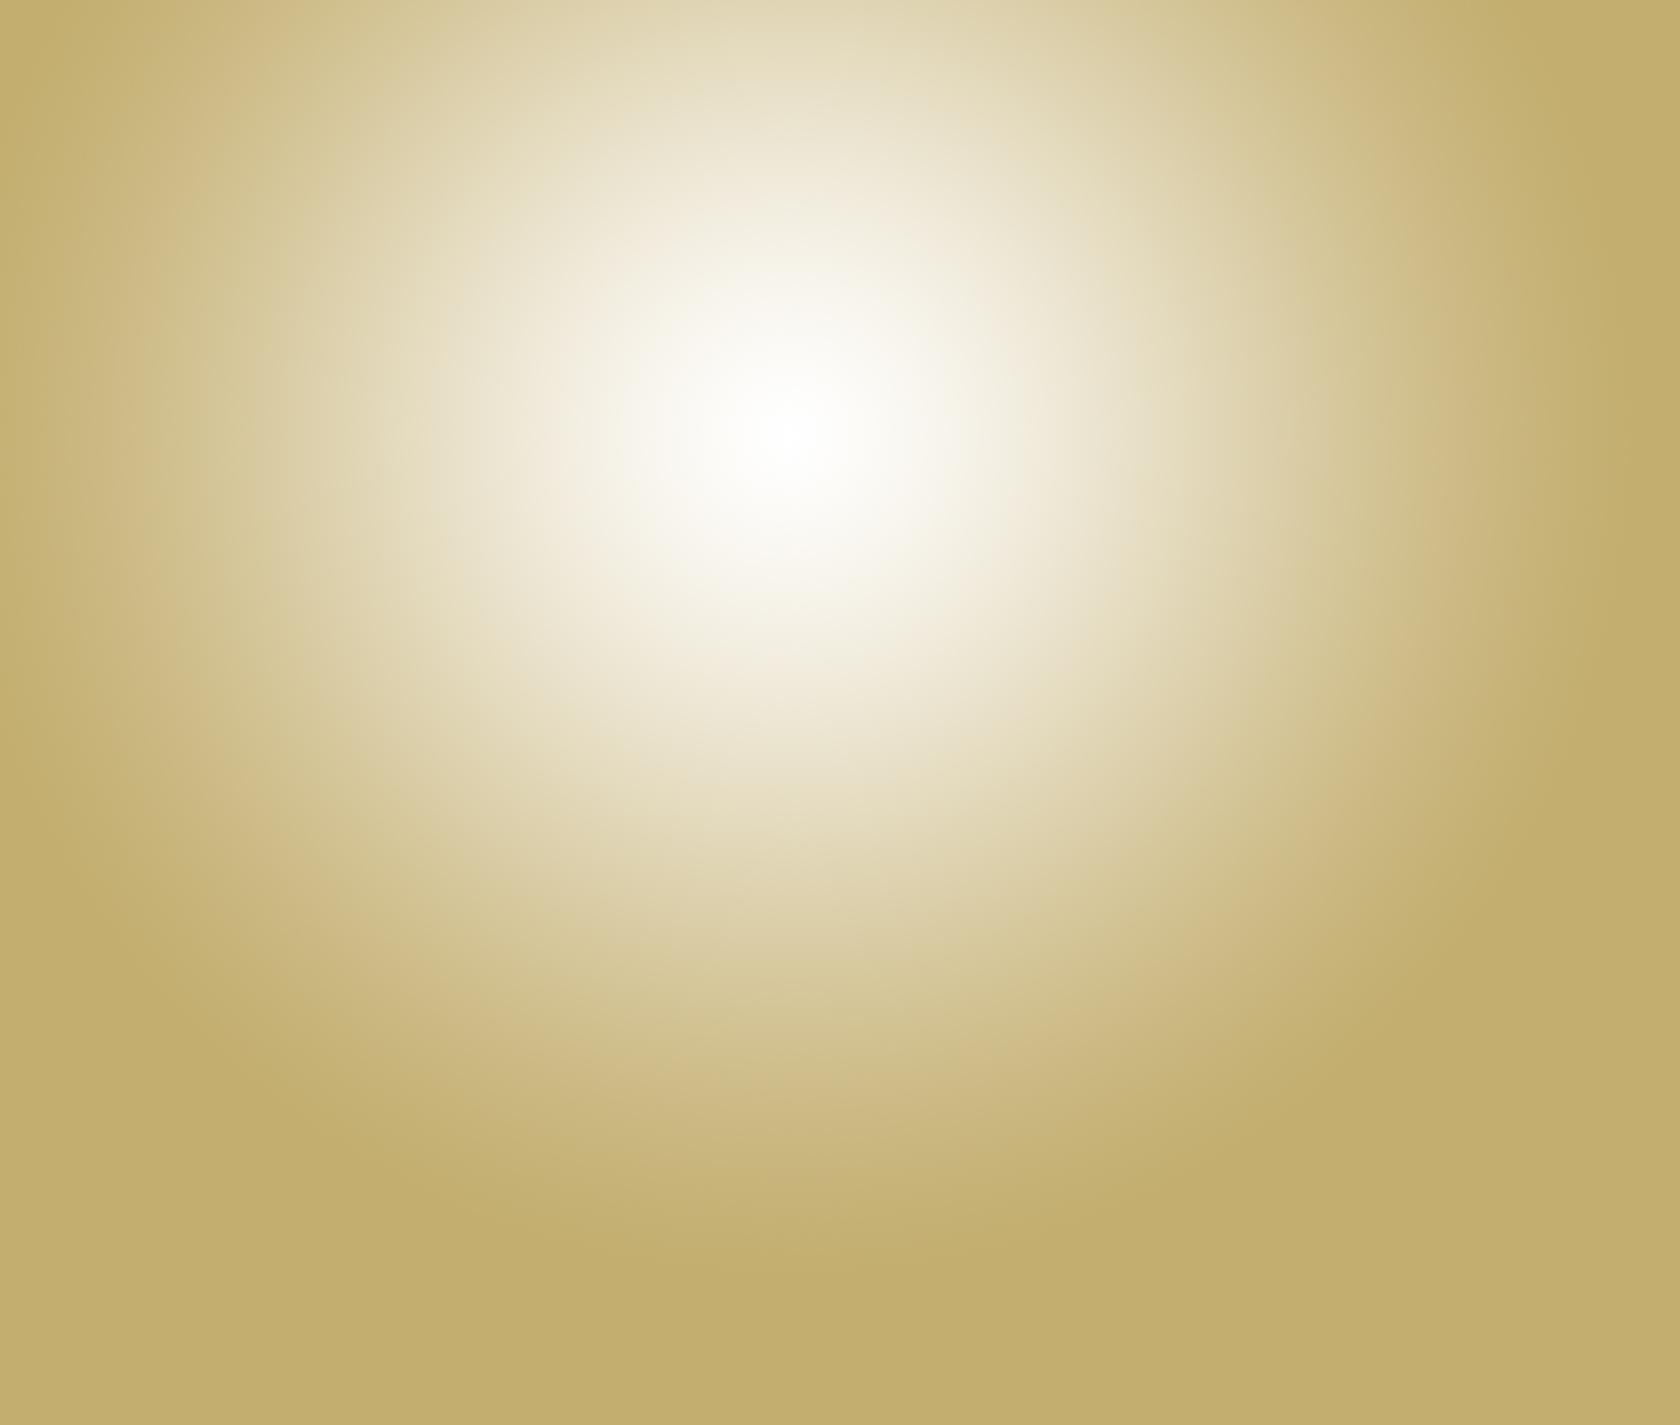 Light Gold Background 1680x1425